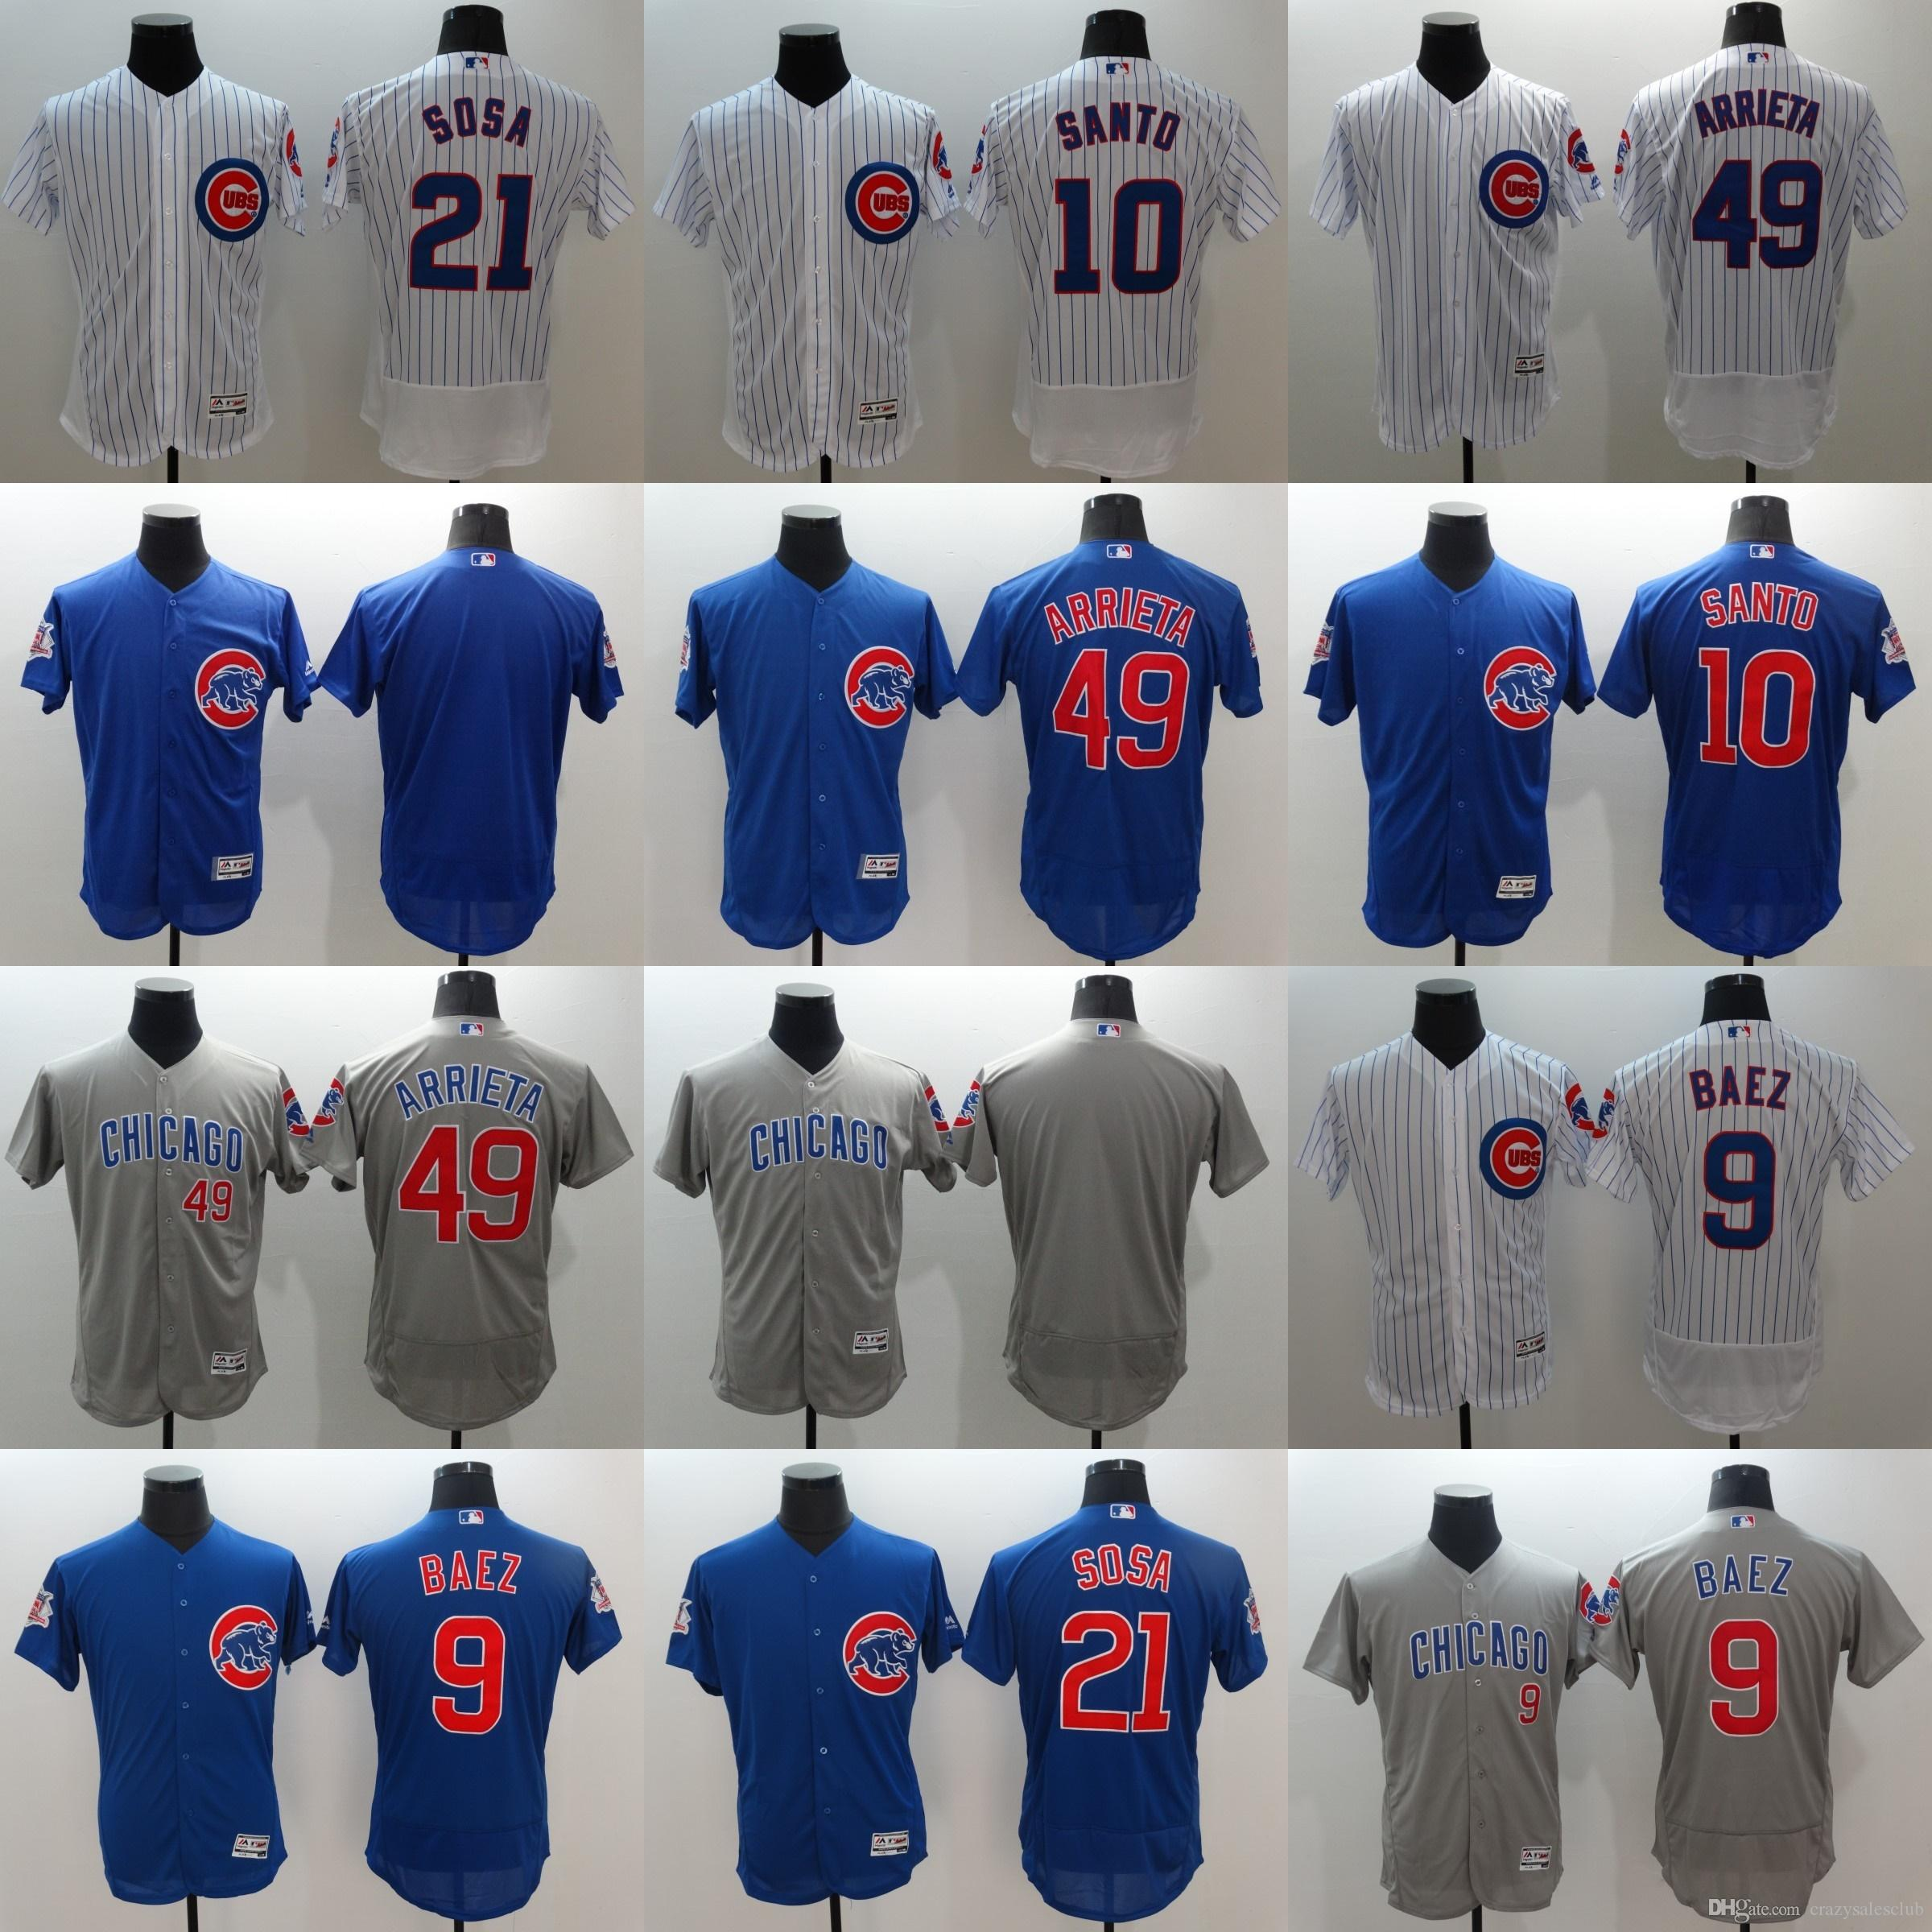 wholesale dealer 22394 6dc1c Baez 21 Chicago 10 Cubs 49 Sosa Arrieta Béisbol Sammy Jake ...